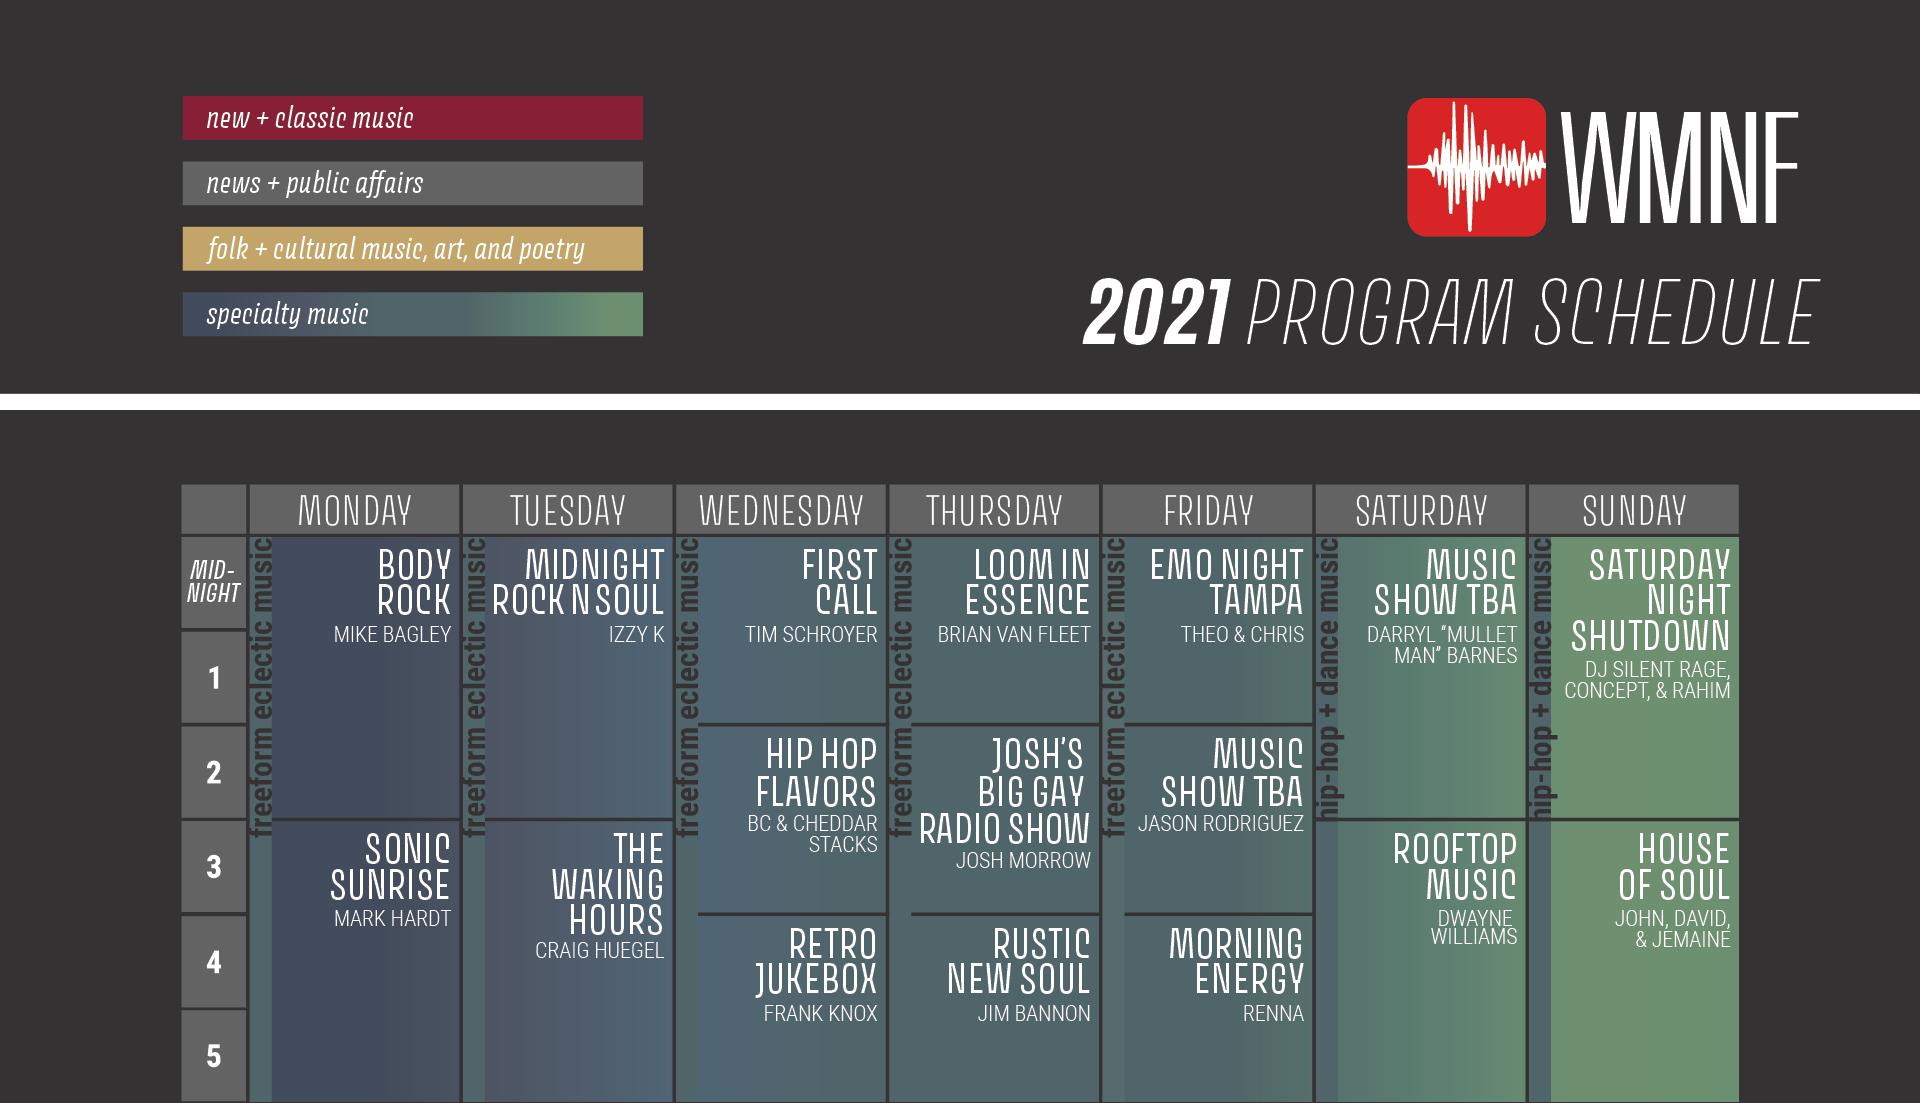 WMNF Program Schedule 2021 Updated